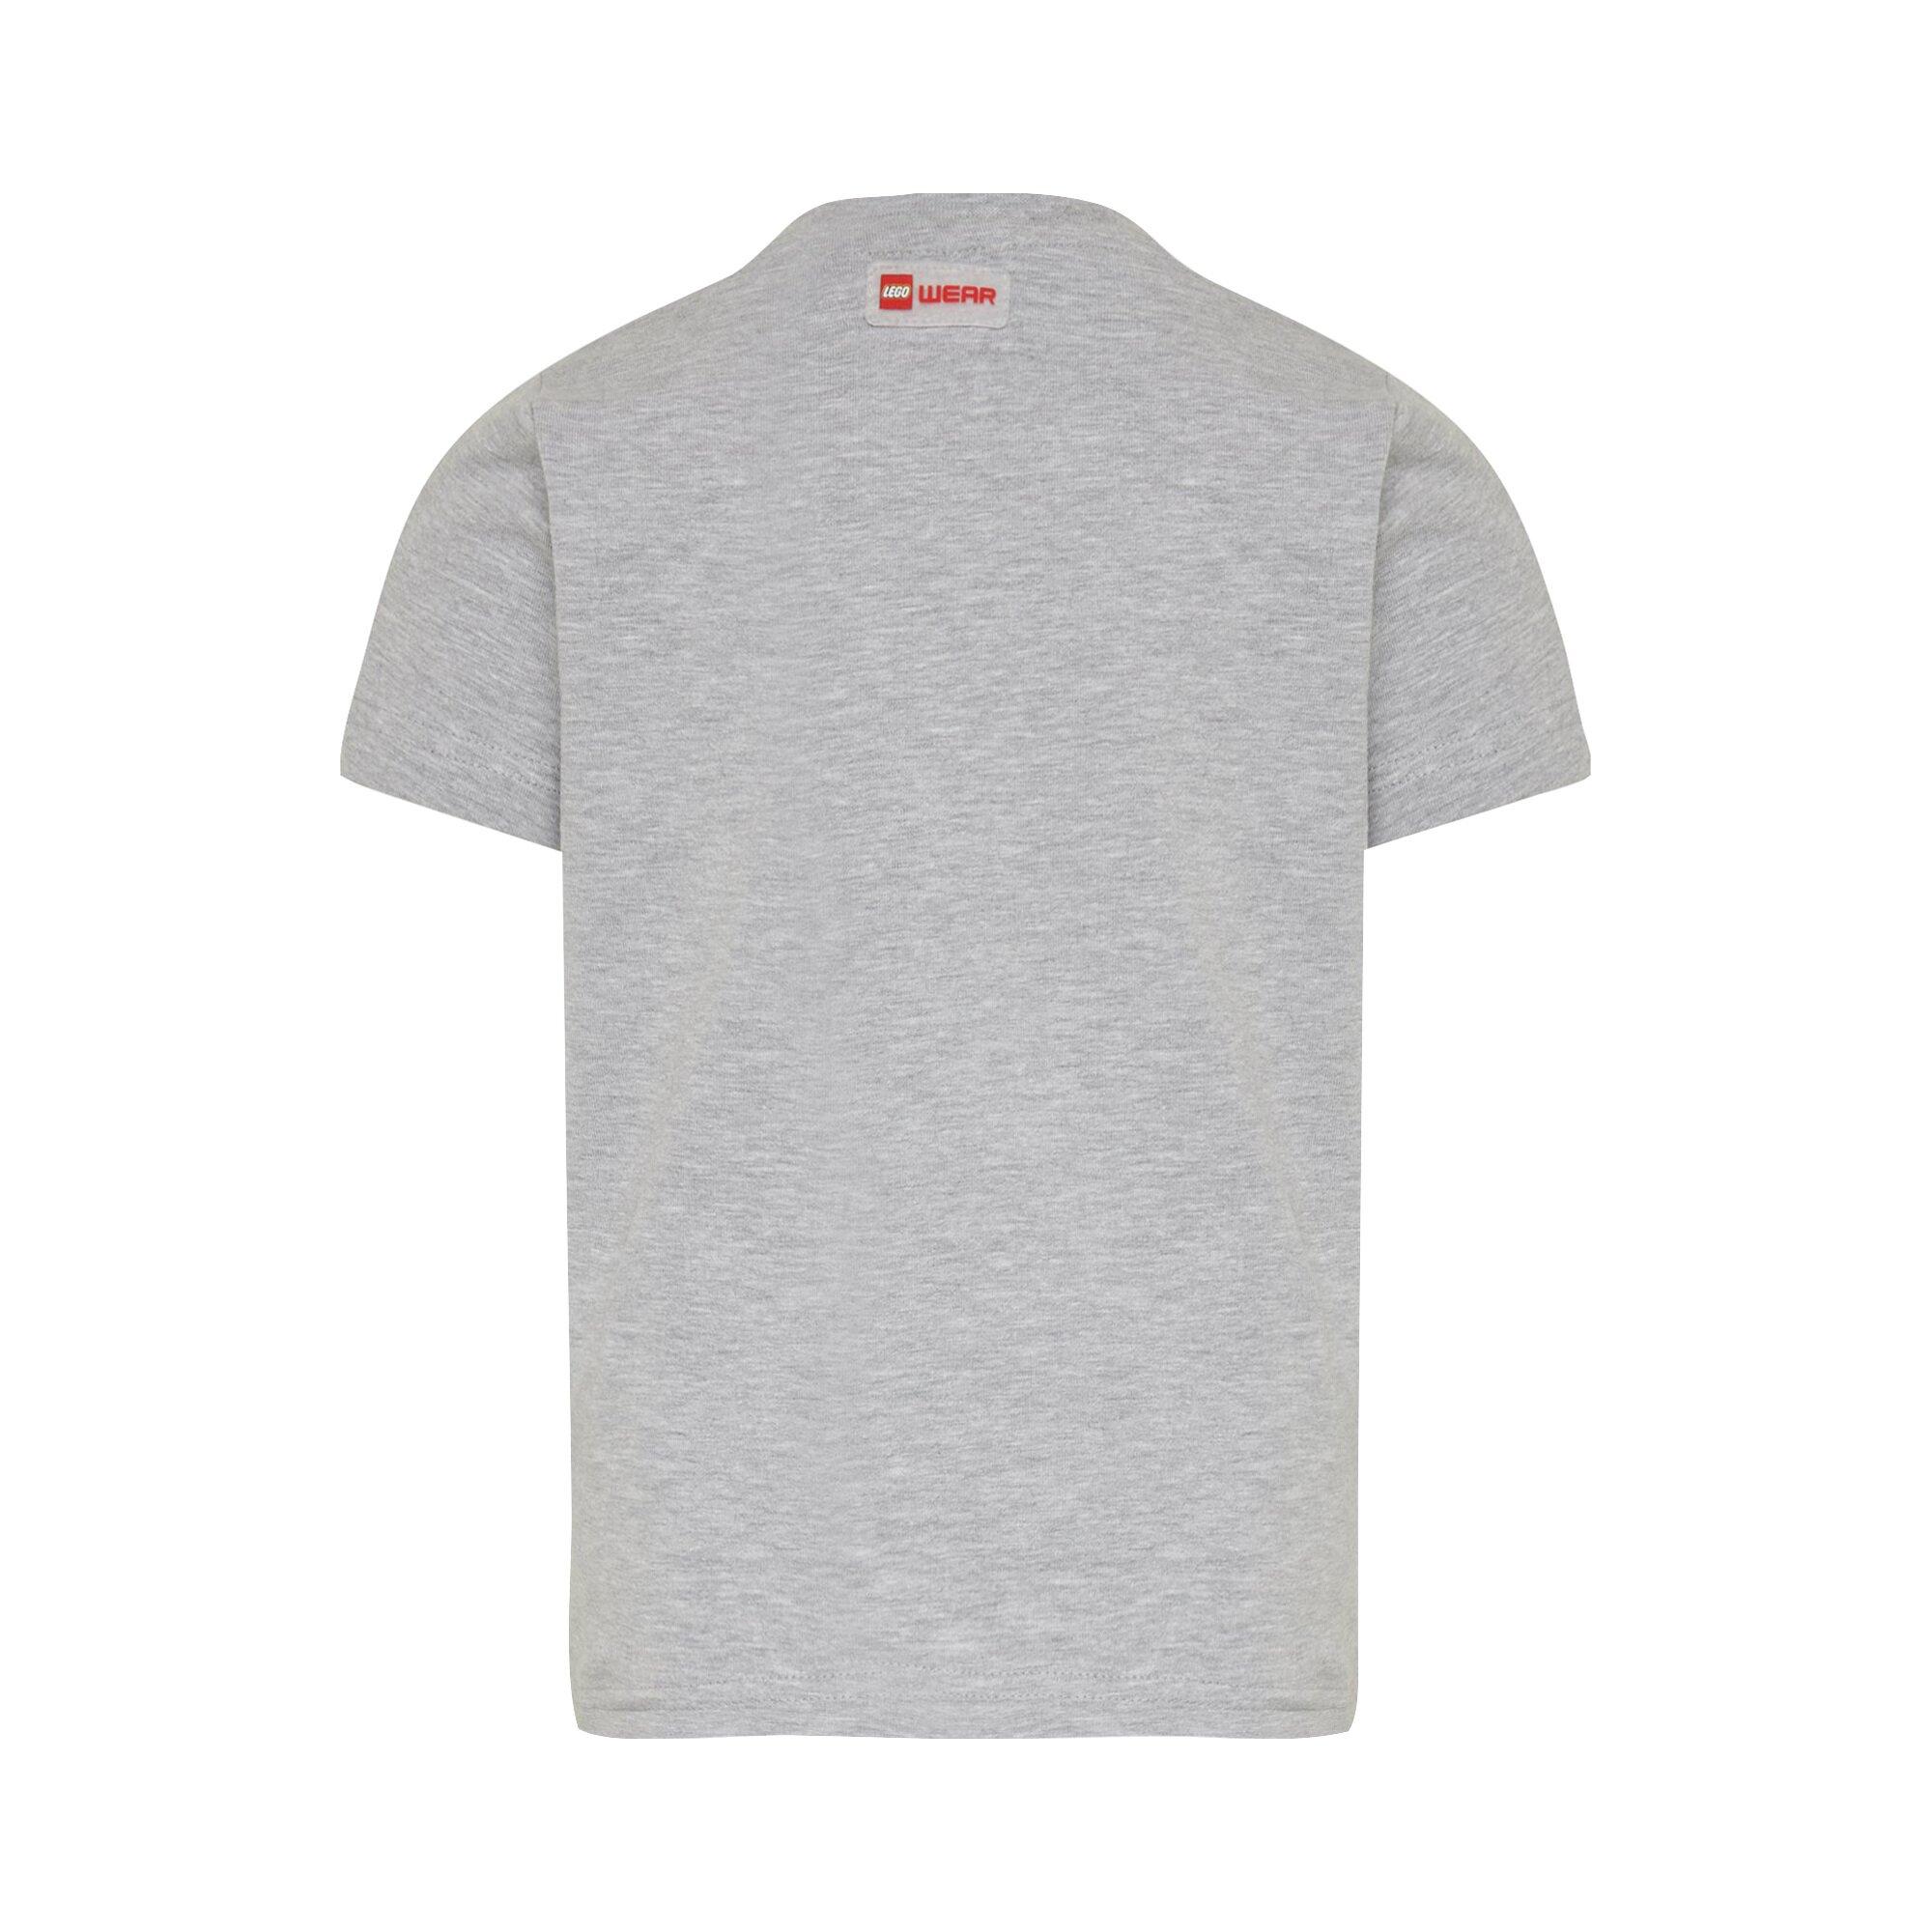 lego-wear-t-shirt-terrence-imagine